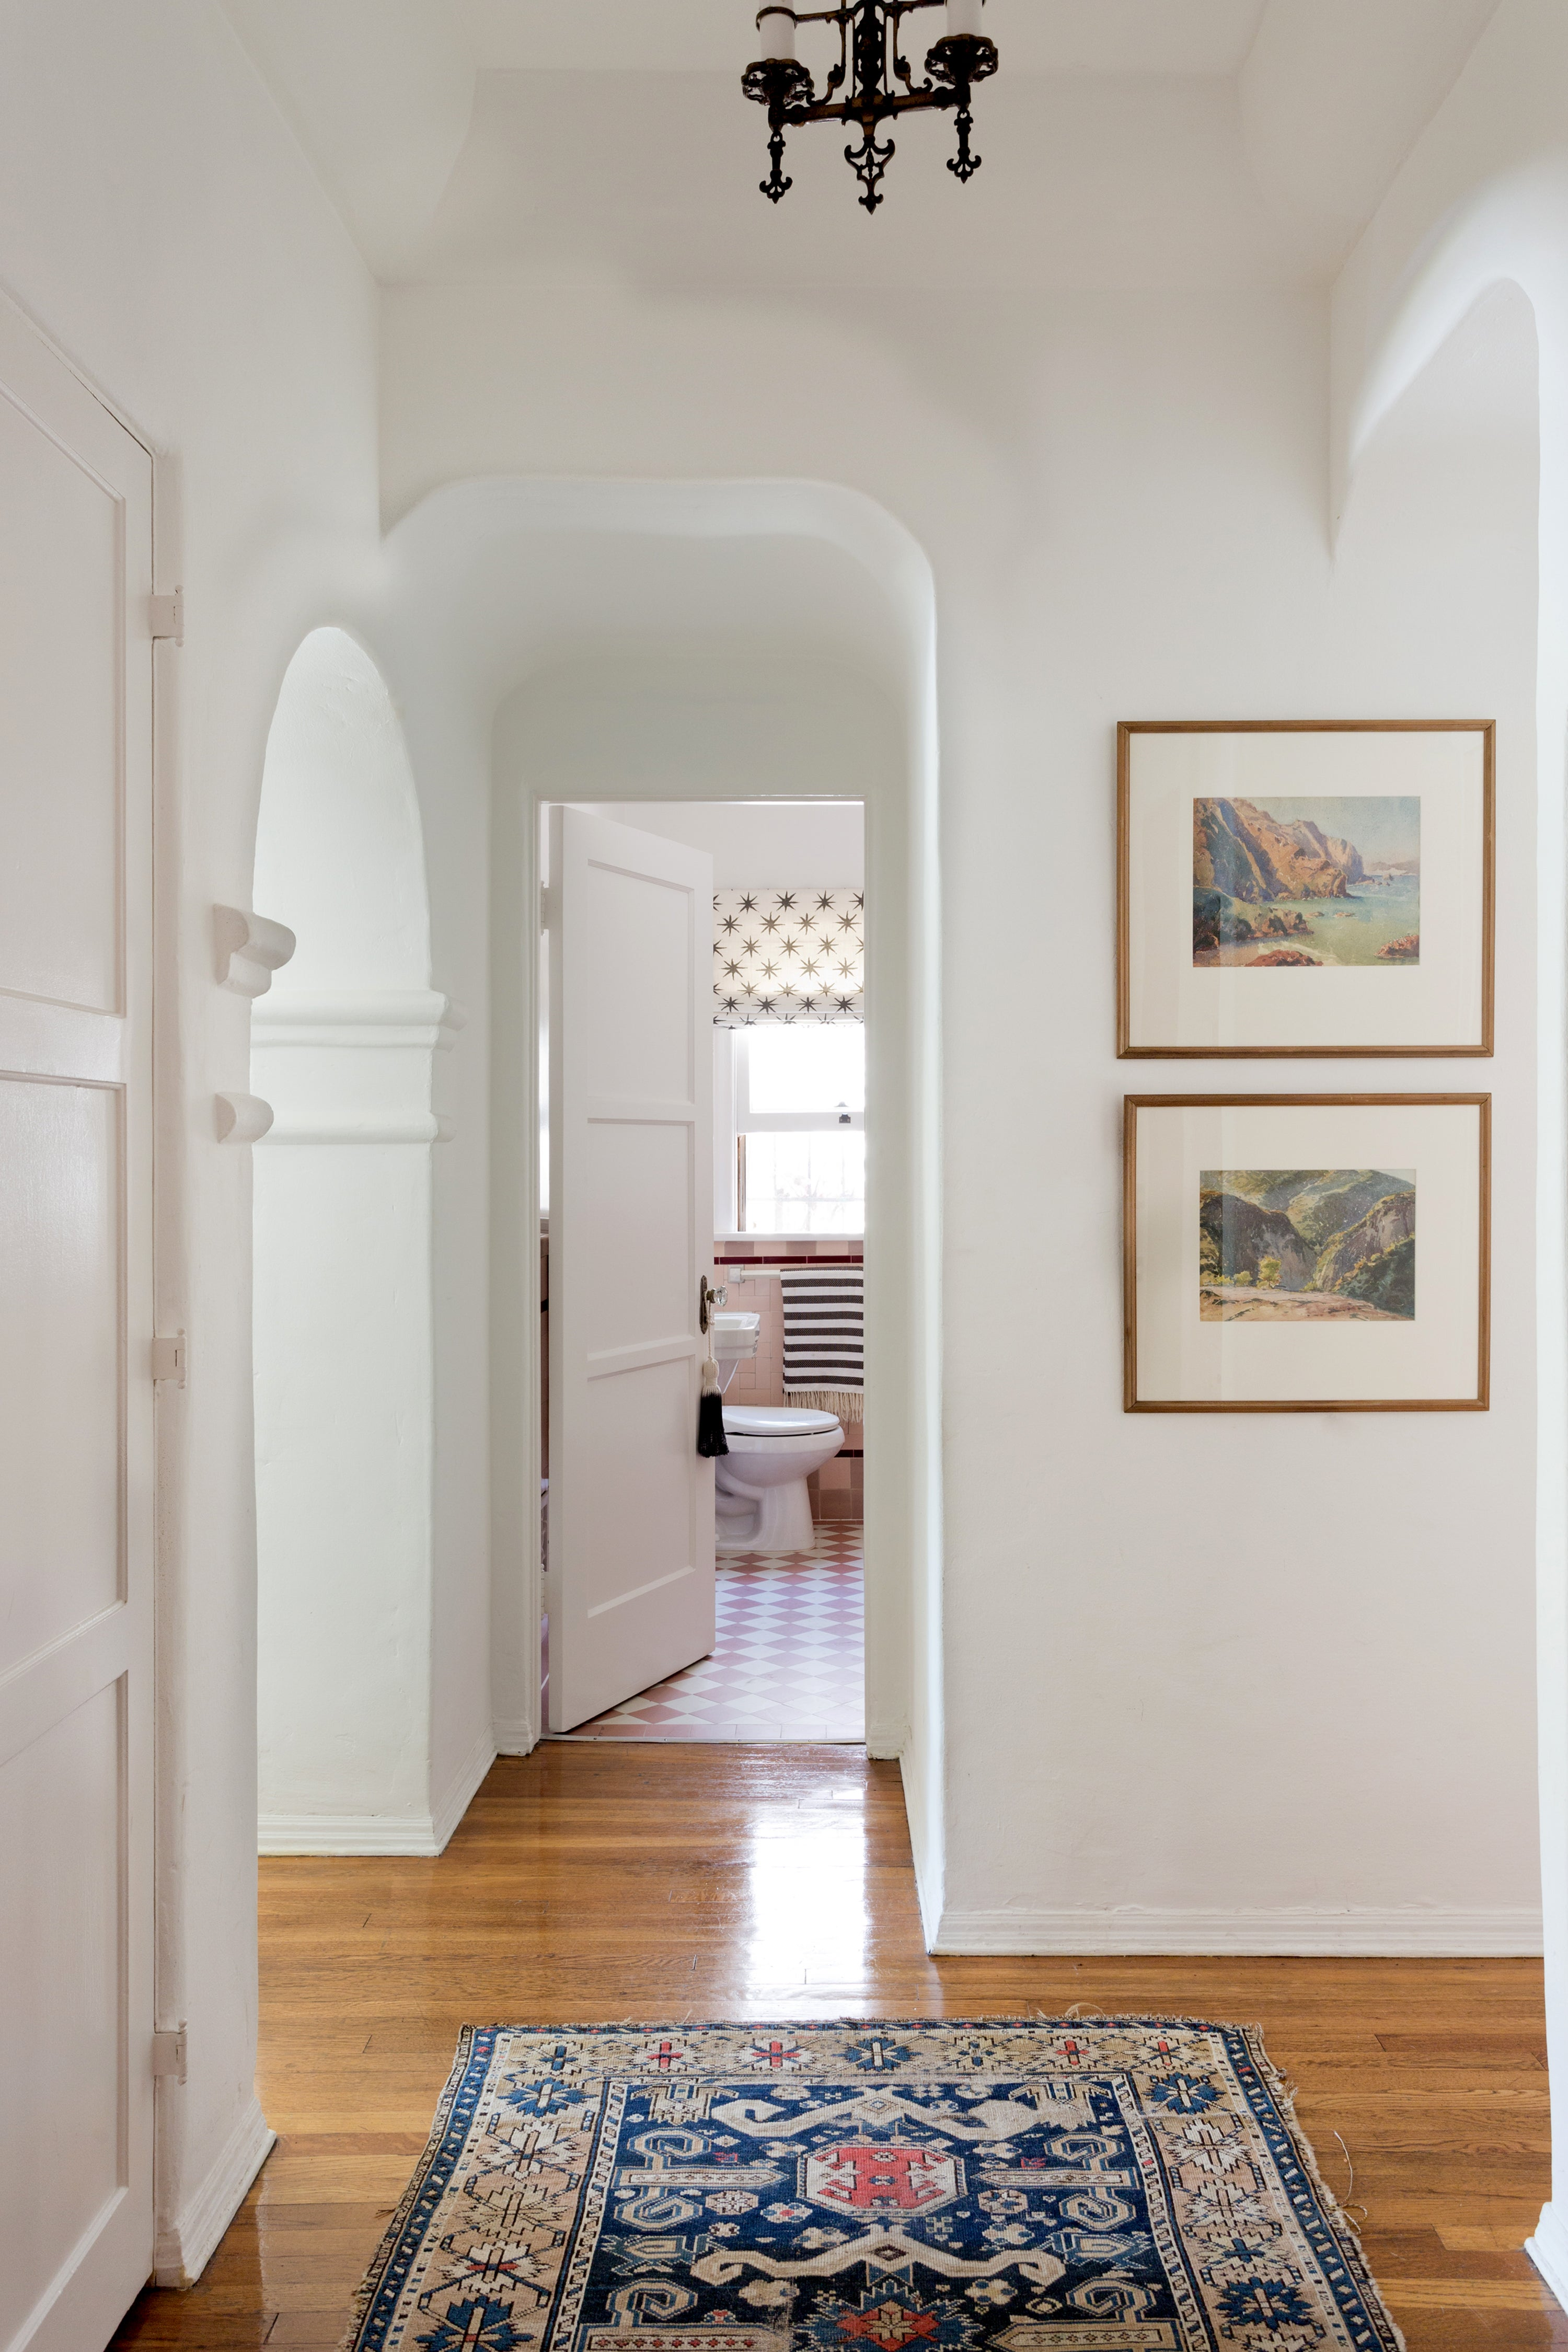 hallway photo wiht white paint and hardwood floors